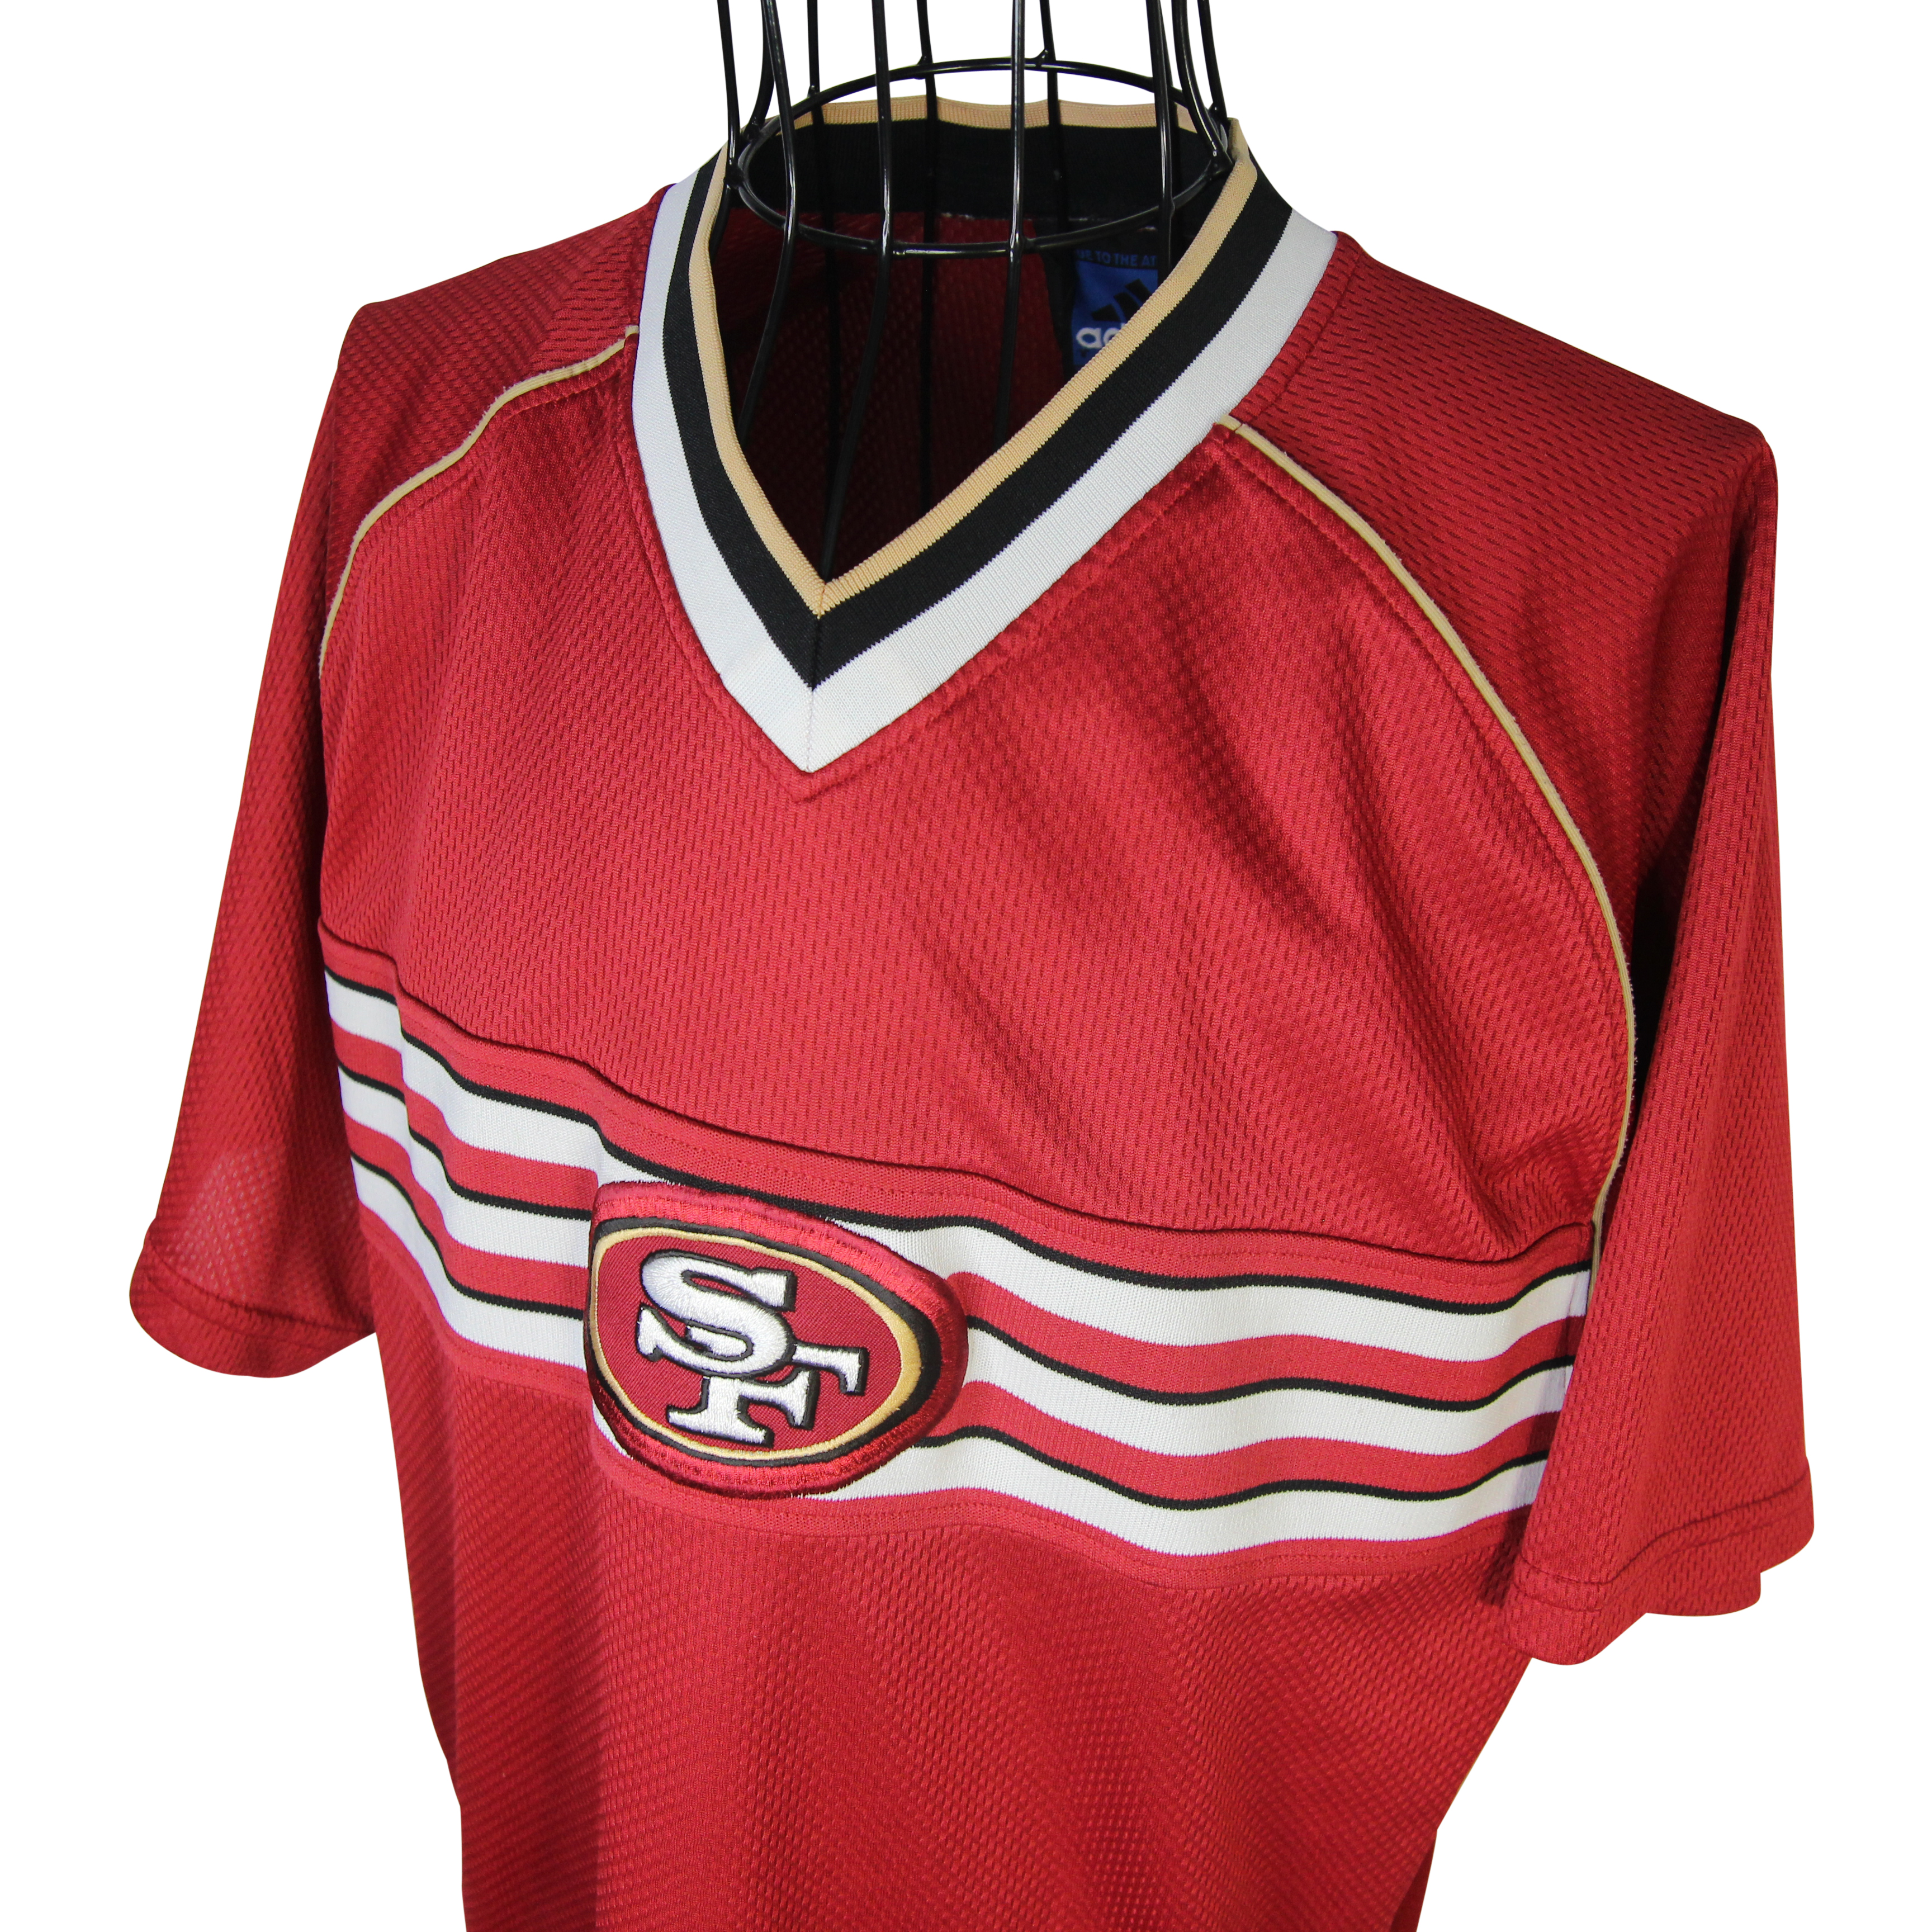 Adidas Vintage Adidas San Francisco 49ers Patch Jersey Shirt